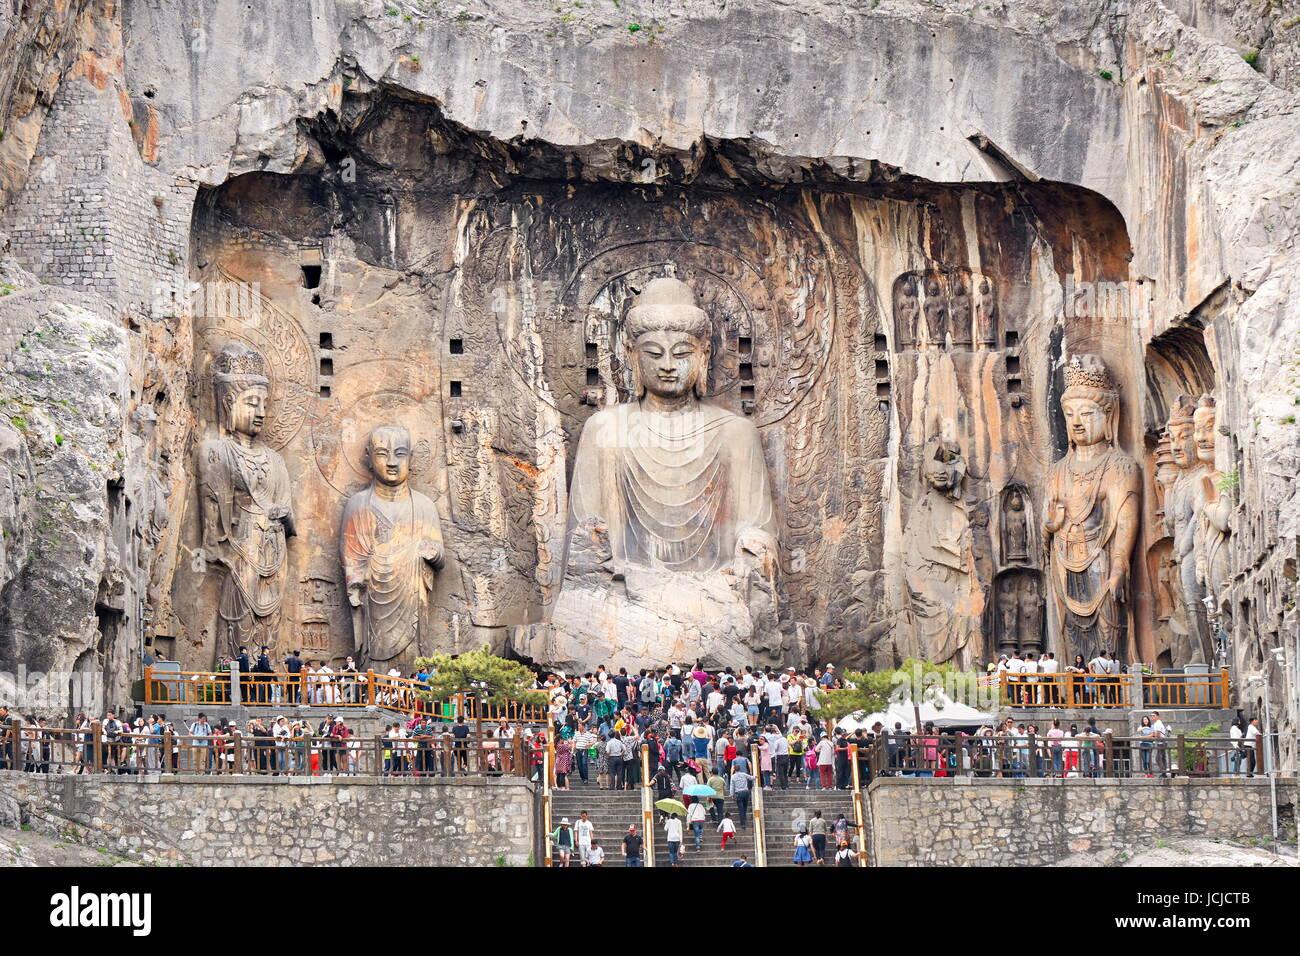 Longmen Grottoes, Luoyang, China - Stock Image